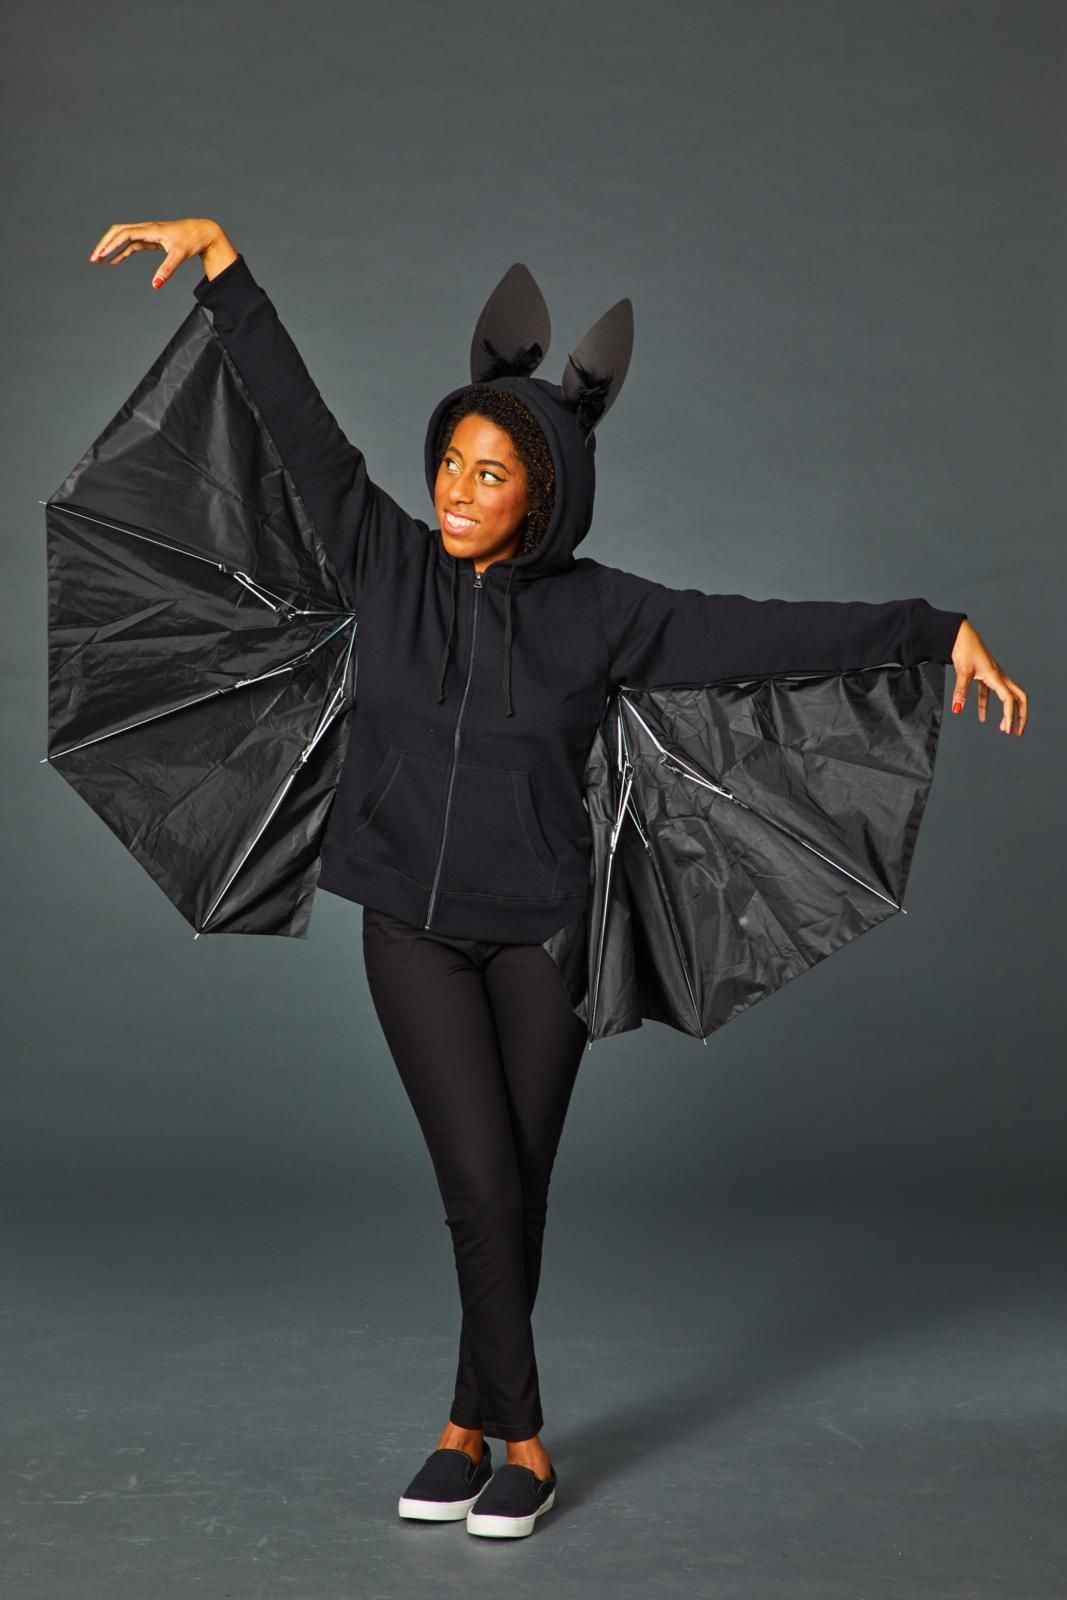 65 Easy Last Minute Halloween Costume Ideas DIY Halloween